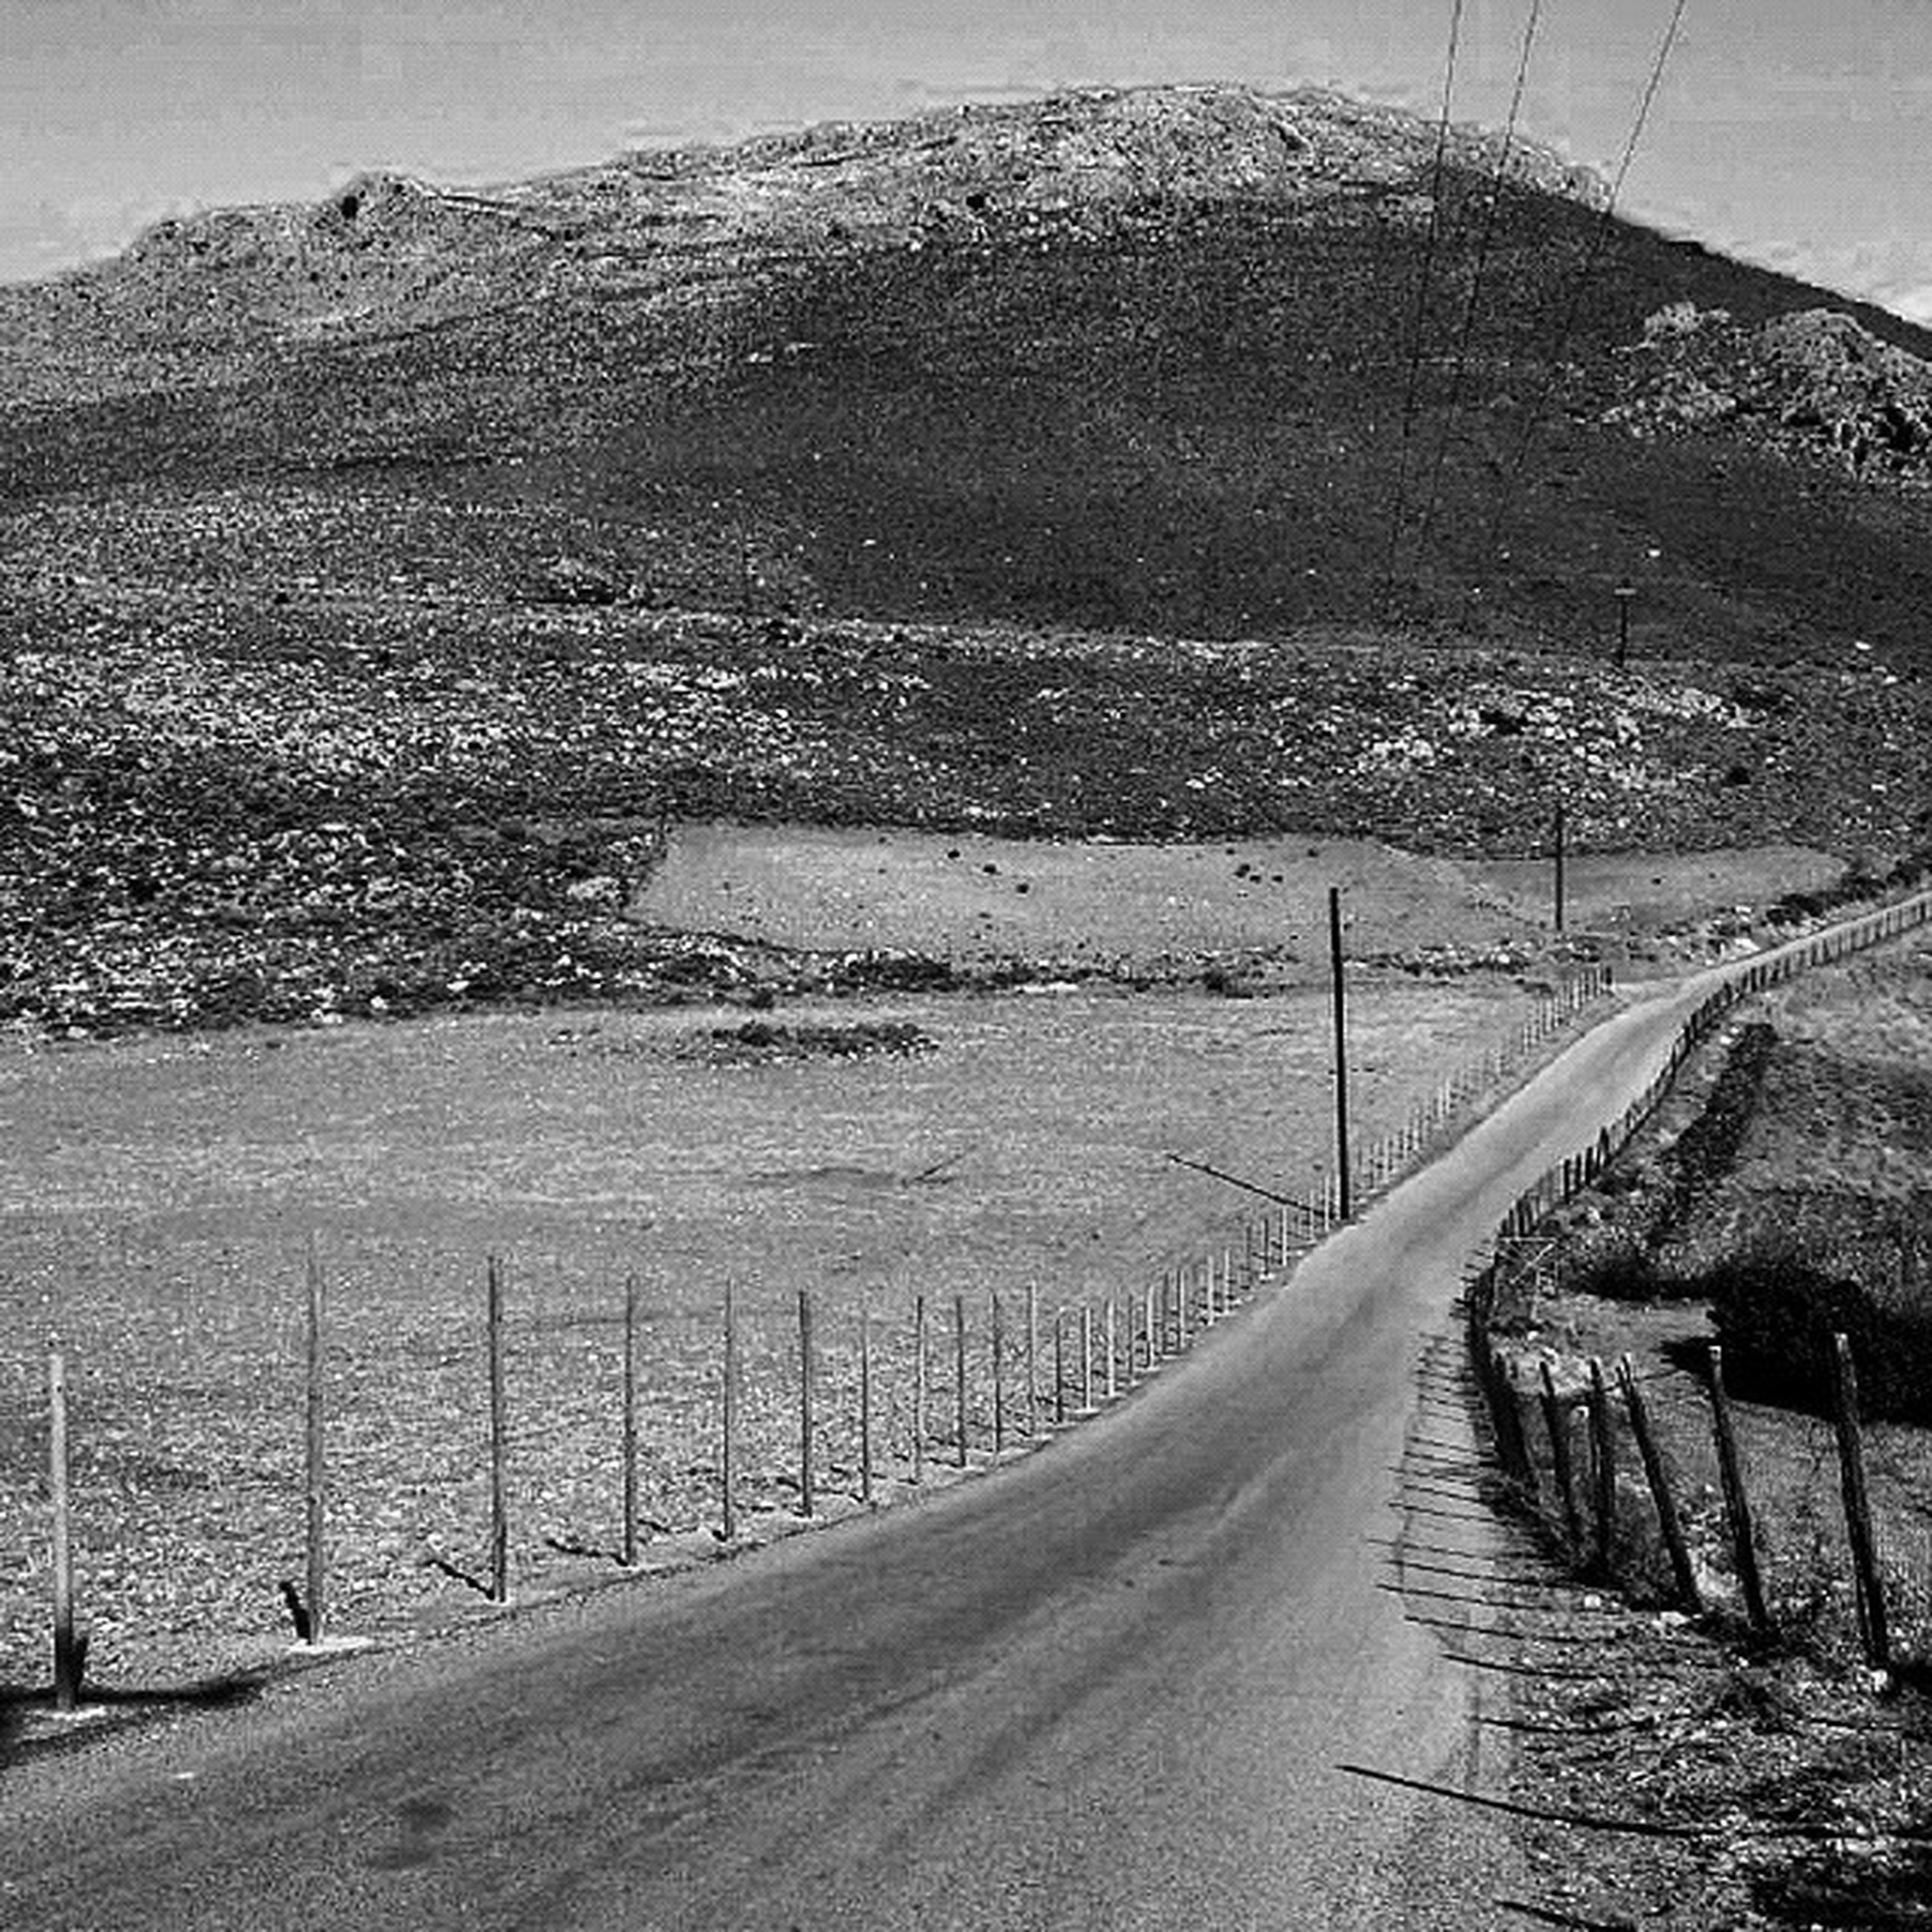 way out Crete Greece Foinikas Bw monochrome